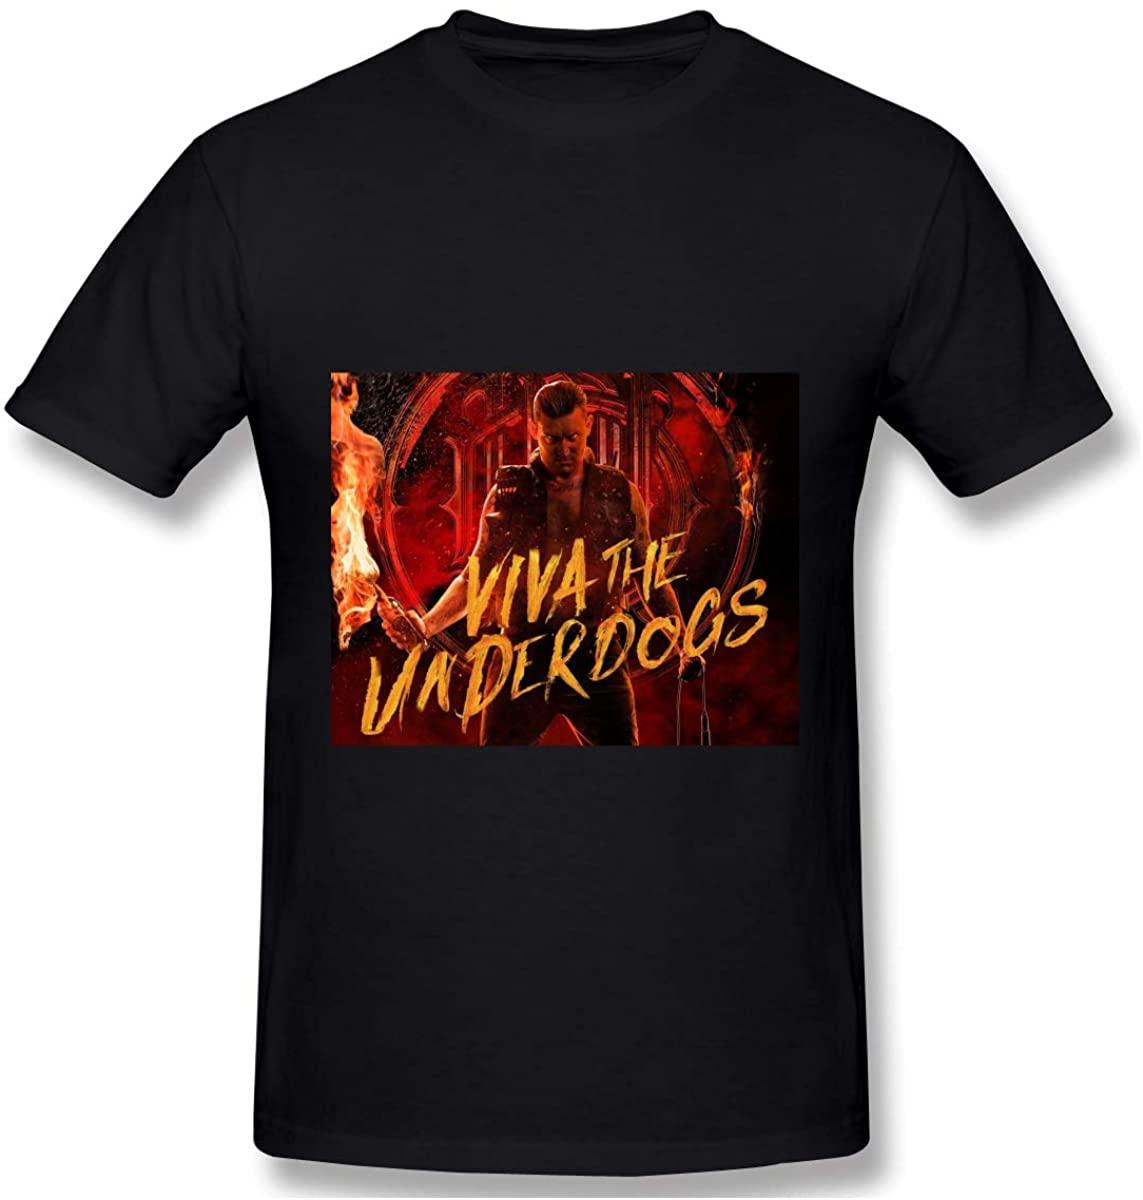 Hbokink Parkway Drive Mans Athletic Men's Cotton Short Sleeve T-Shirt Black